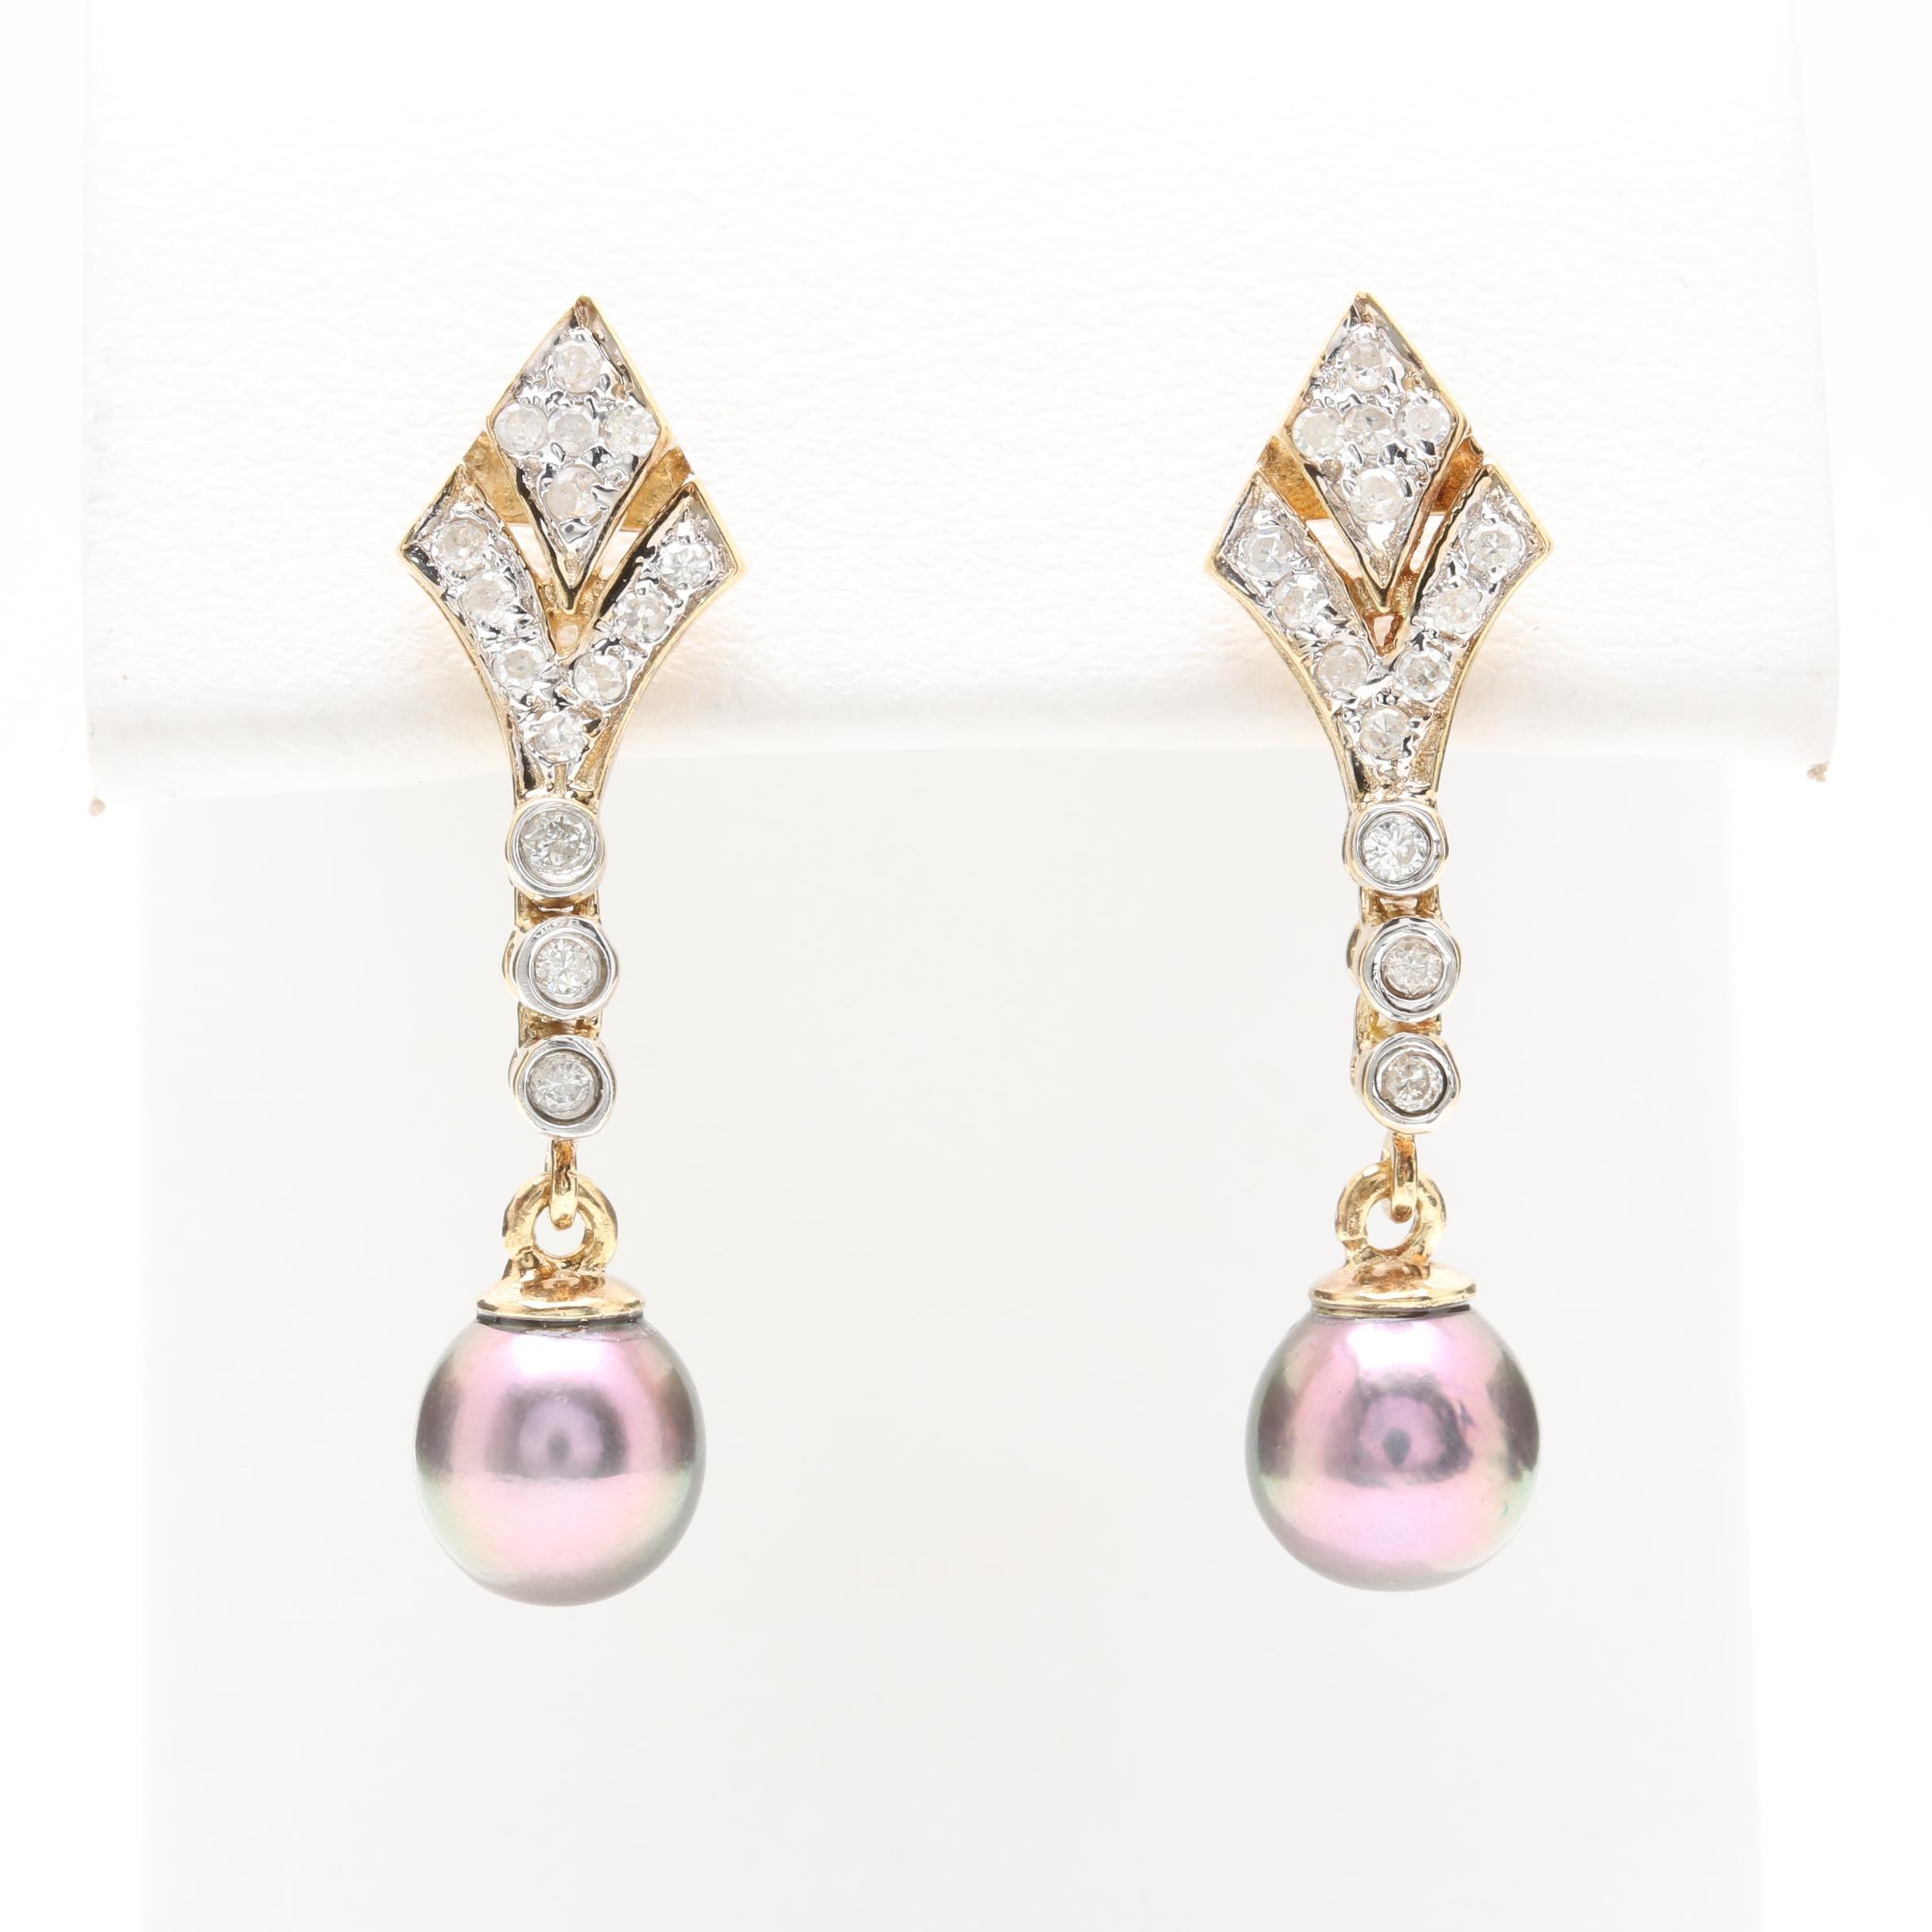 14K Yellow Gold Diamond and Cultured Pearl Dangle Earrings